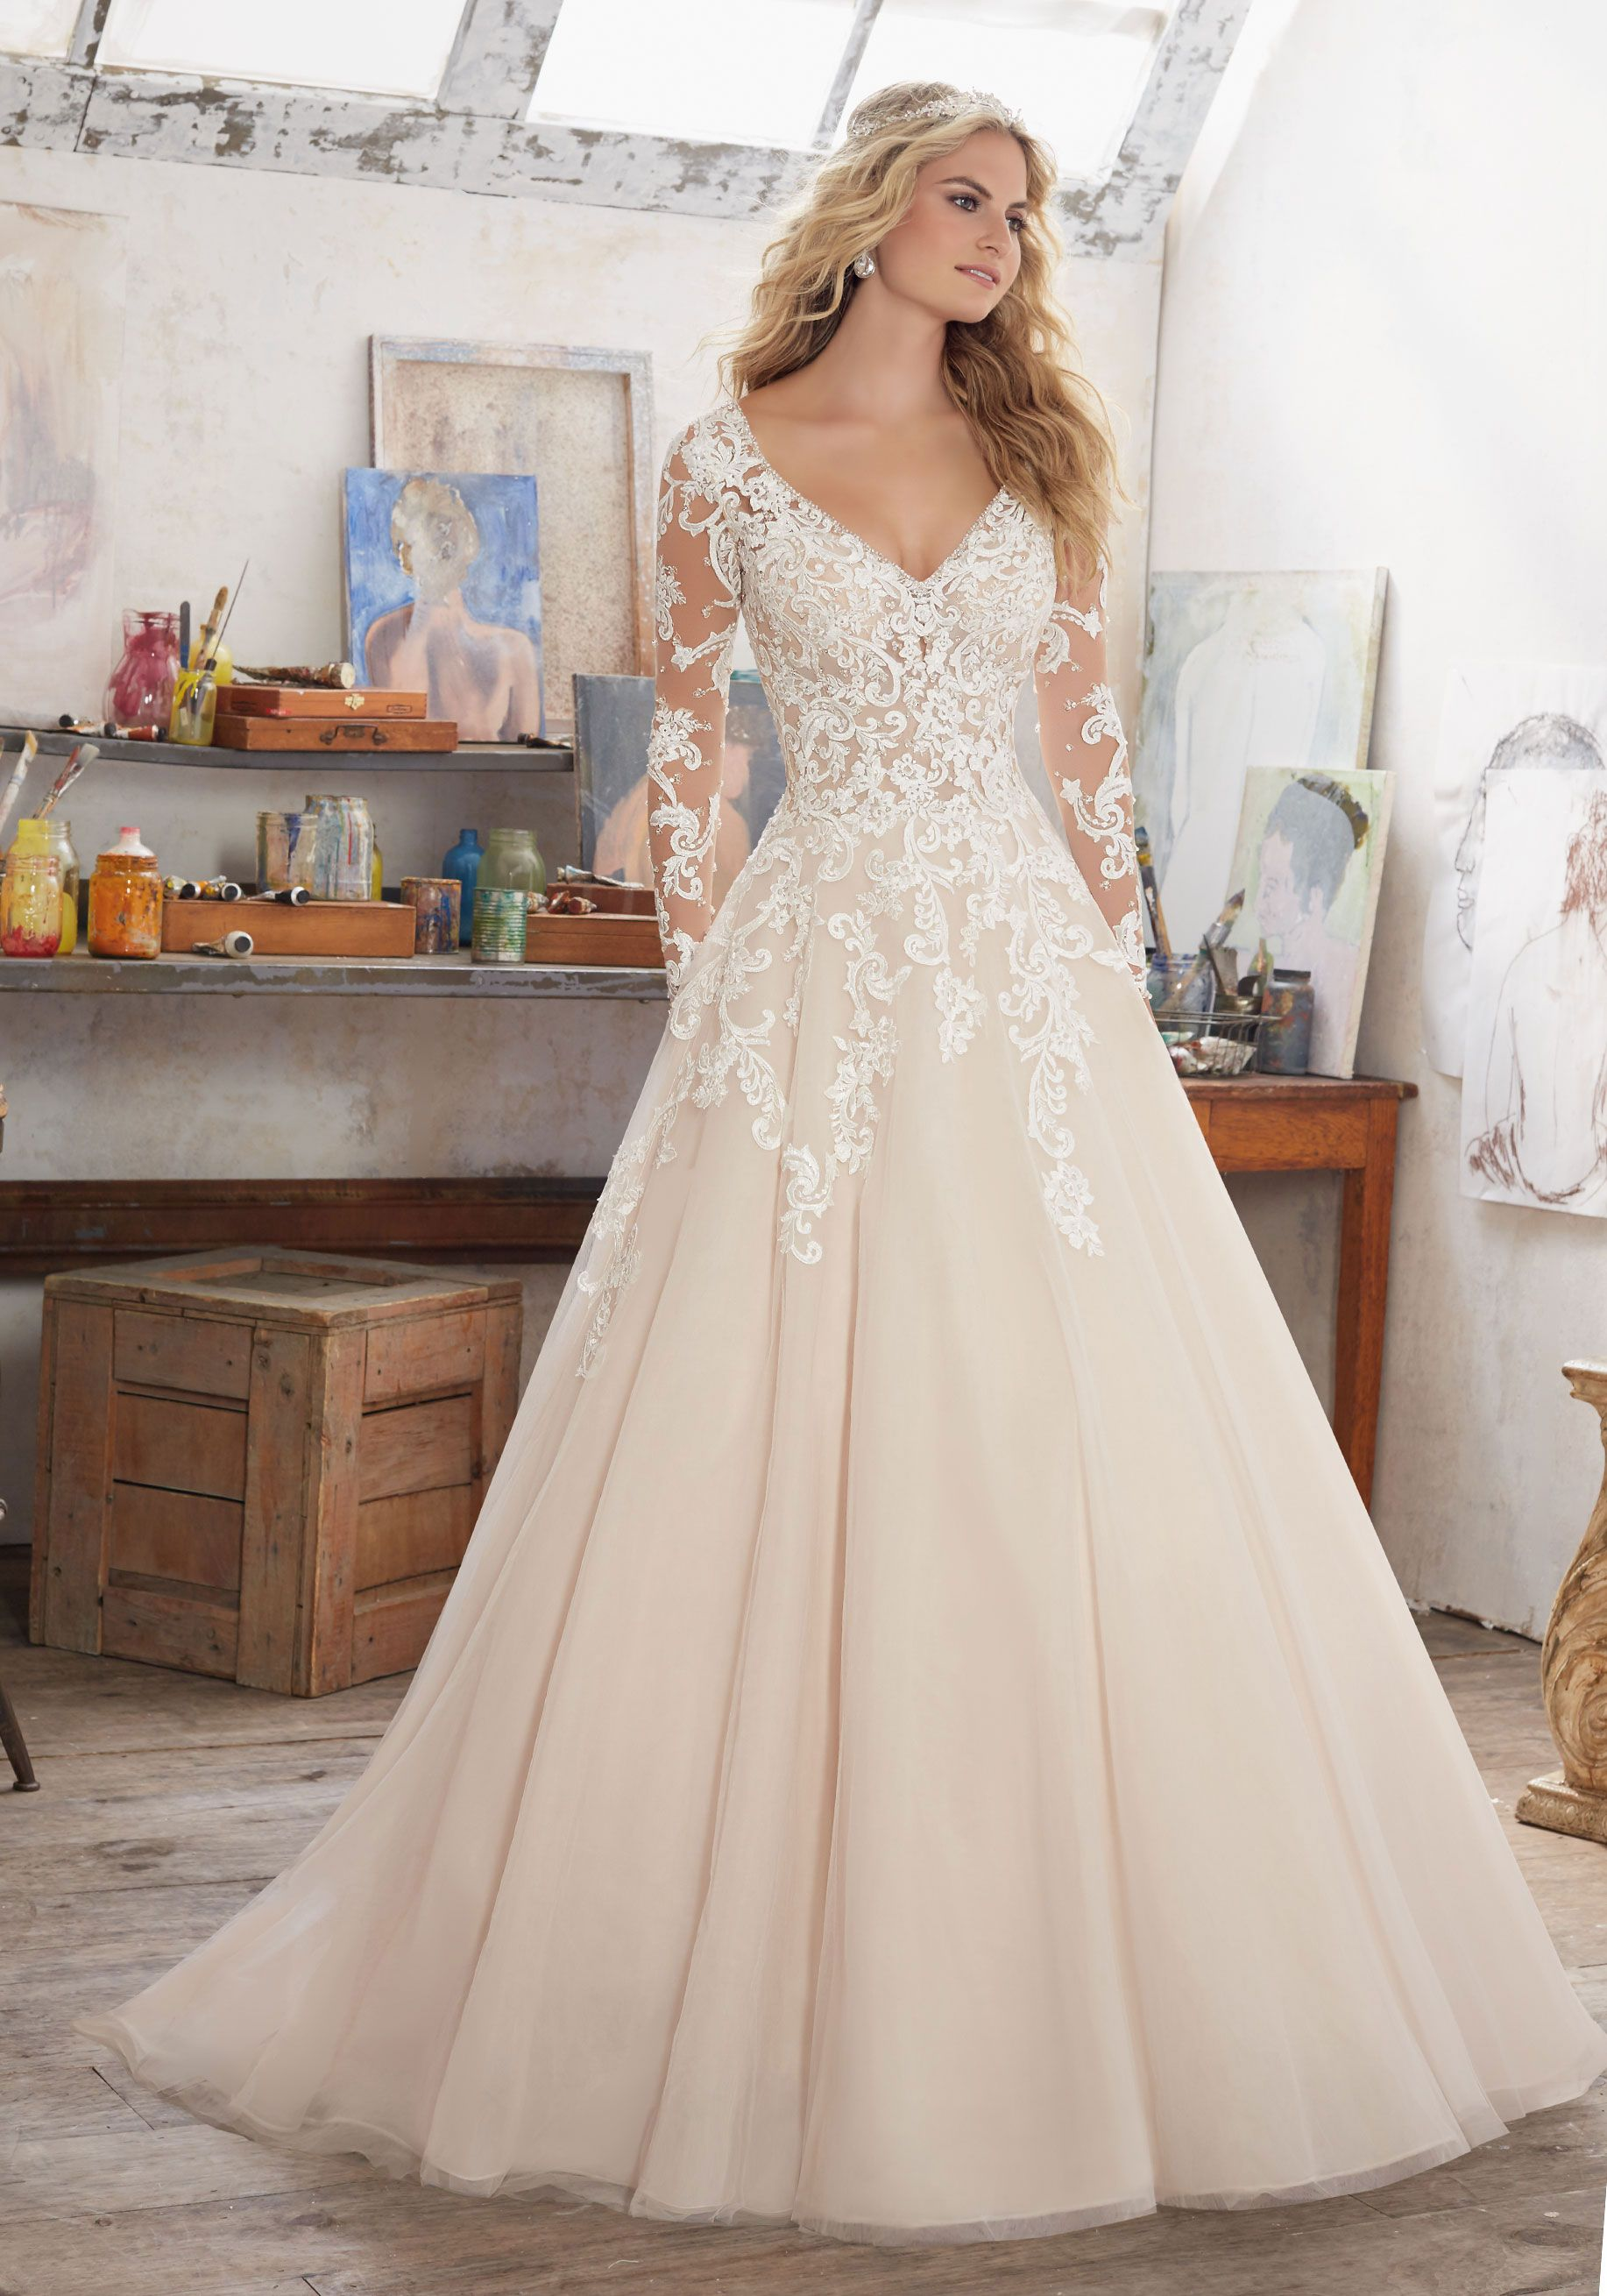 Maira Wedding Dress Morilee Bridal wedding dresses